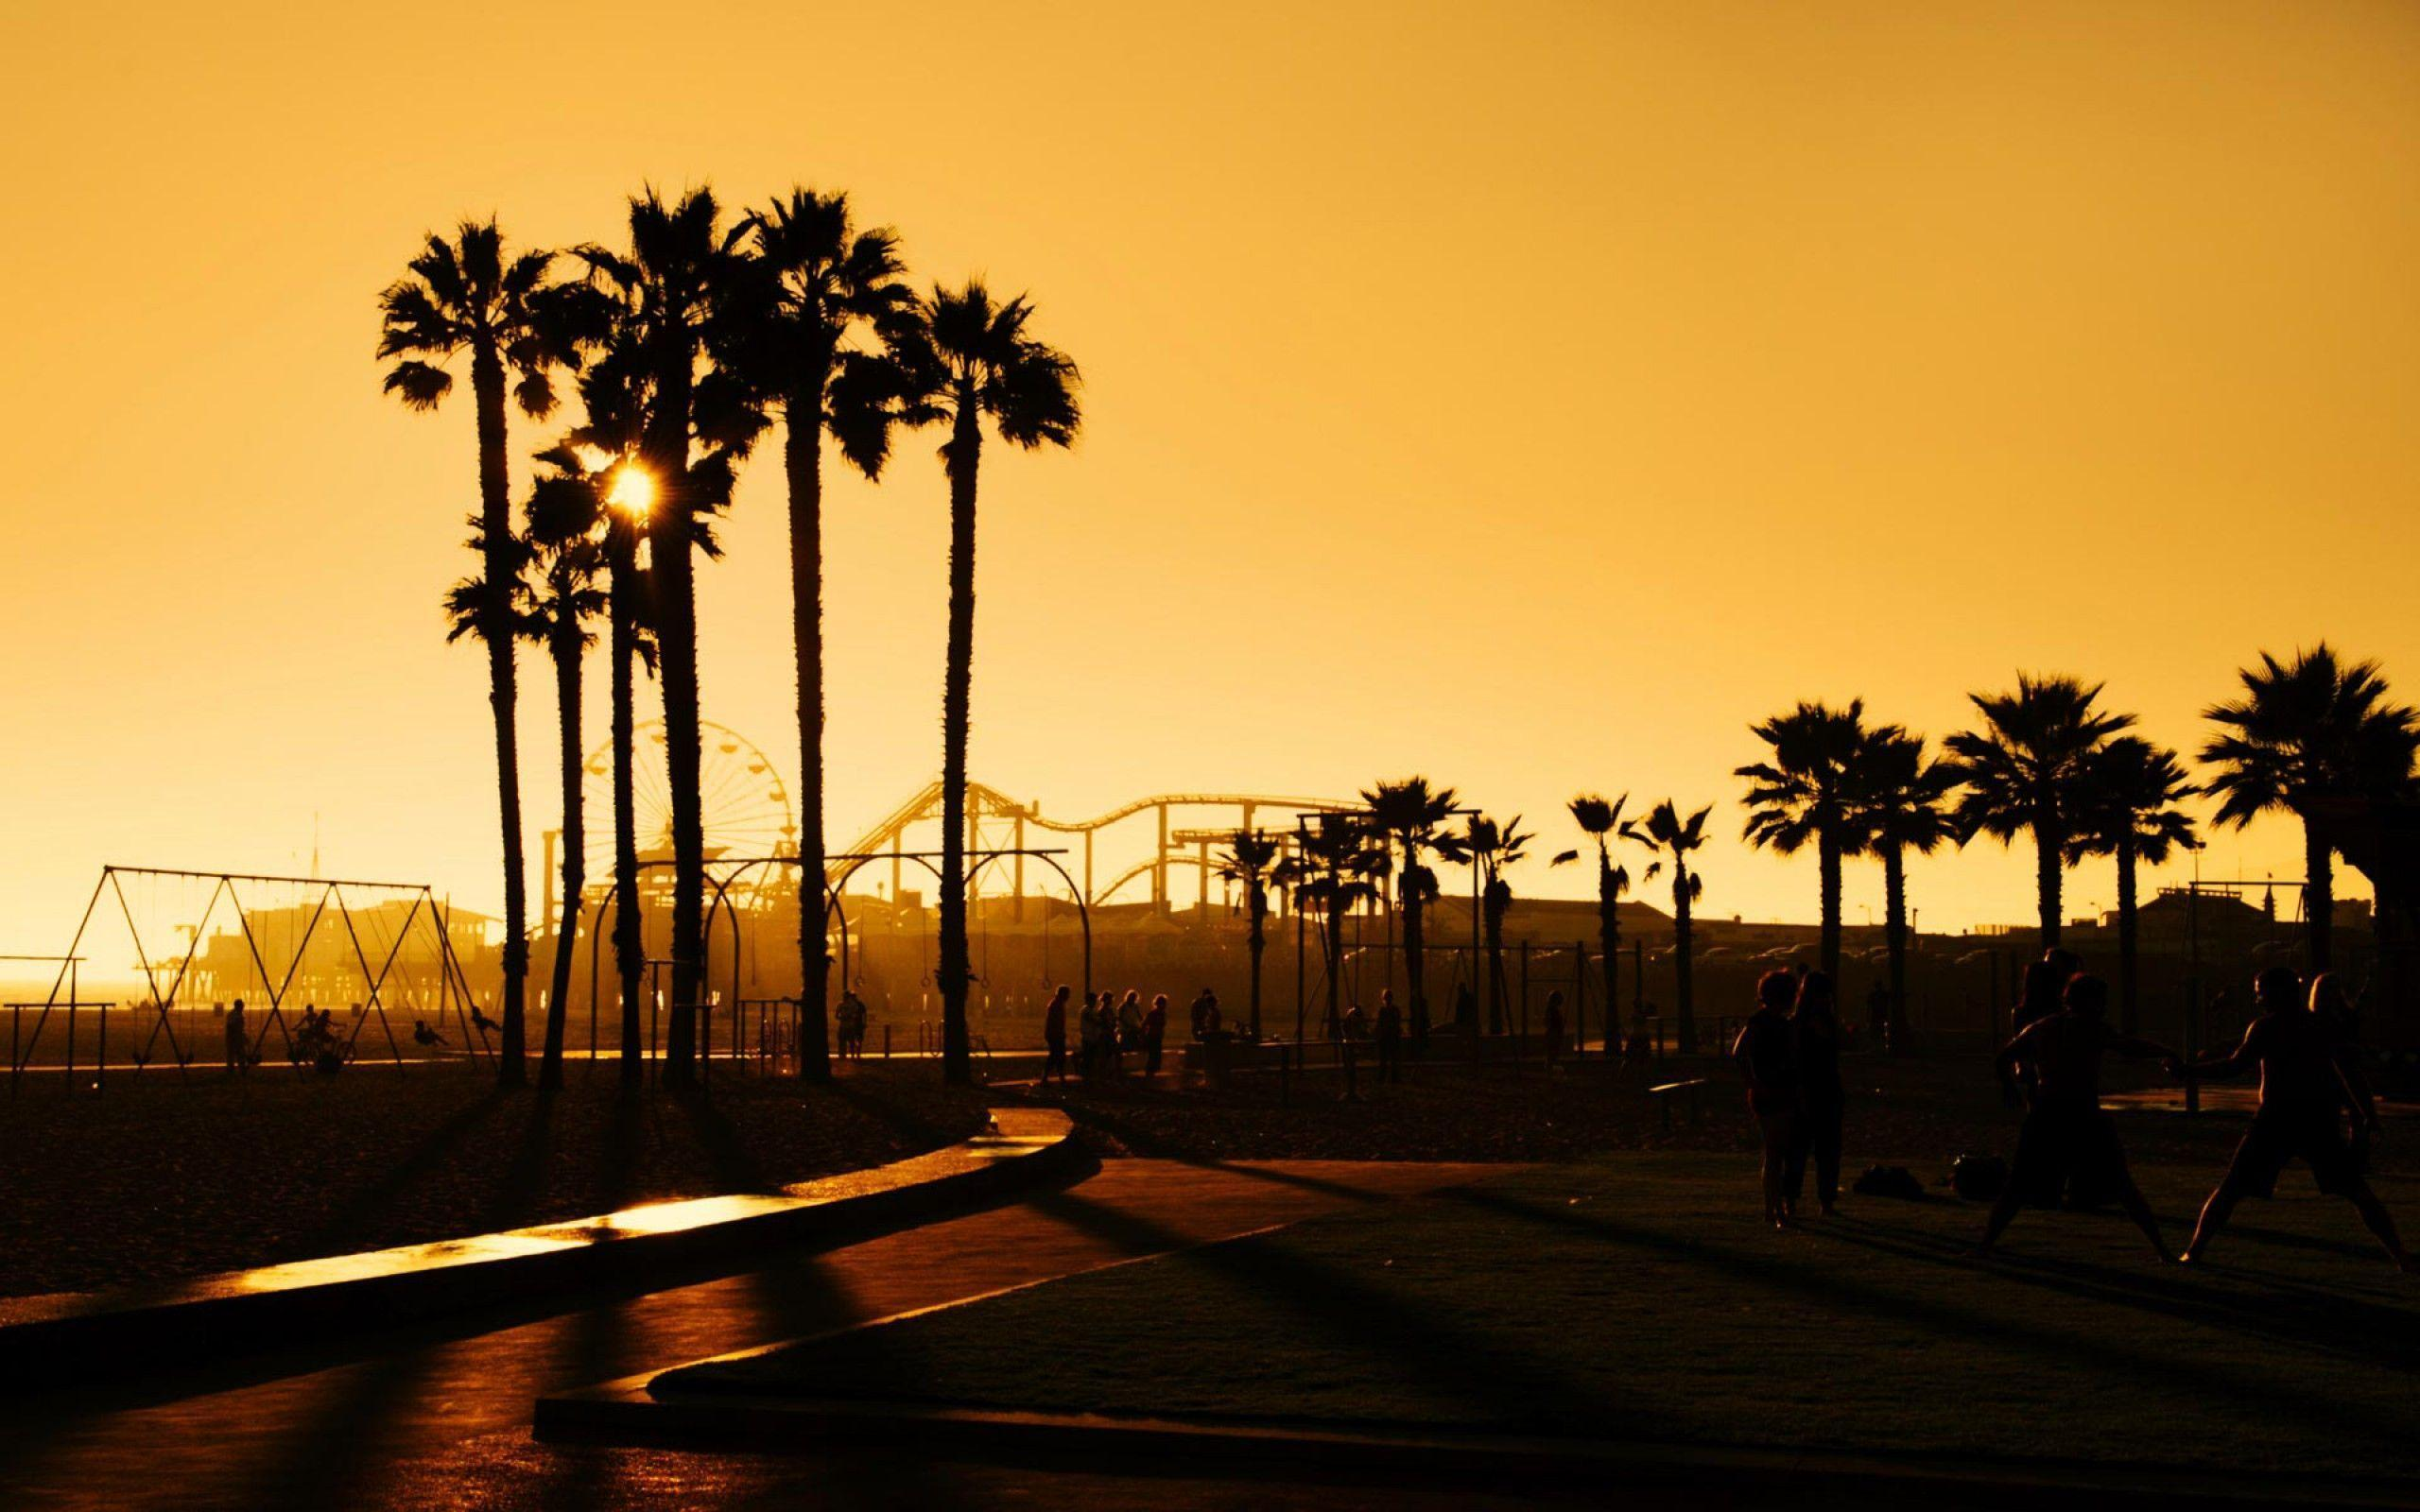 california west coast wallpaper - photo #1